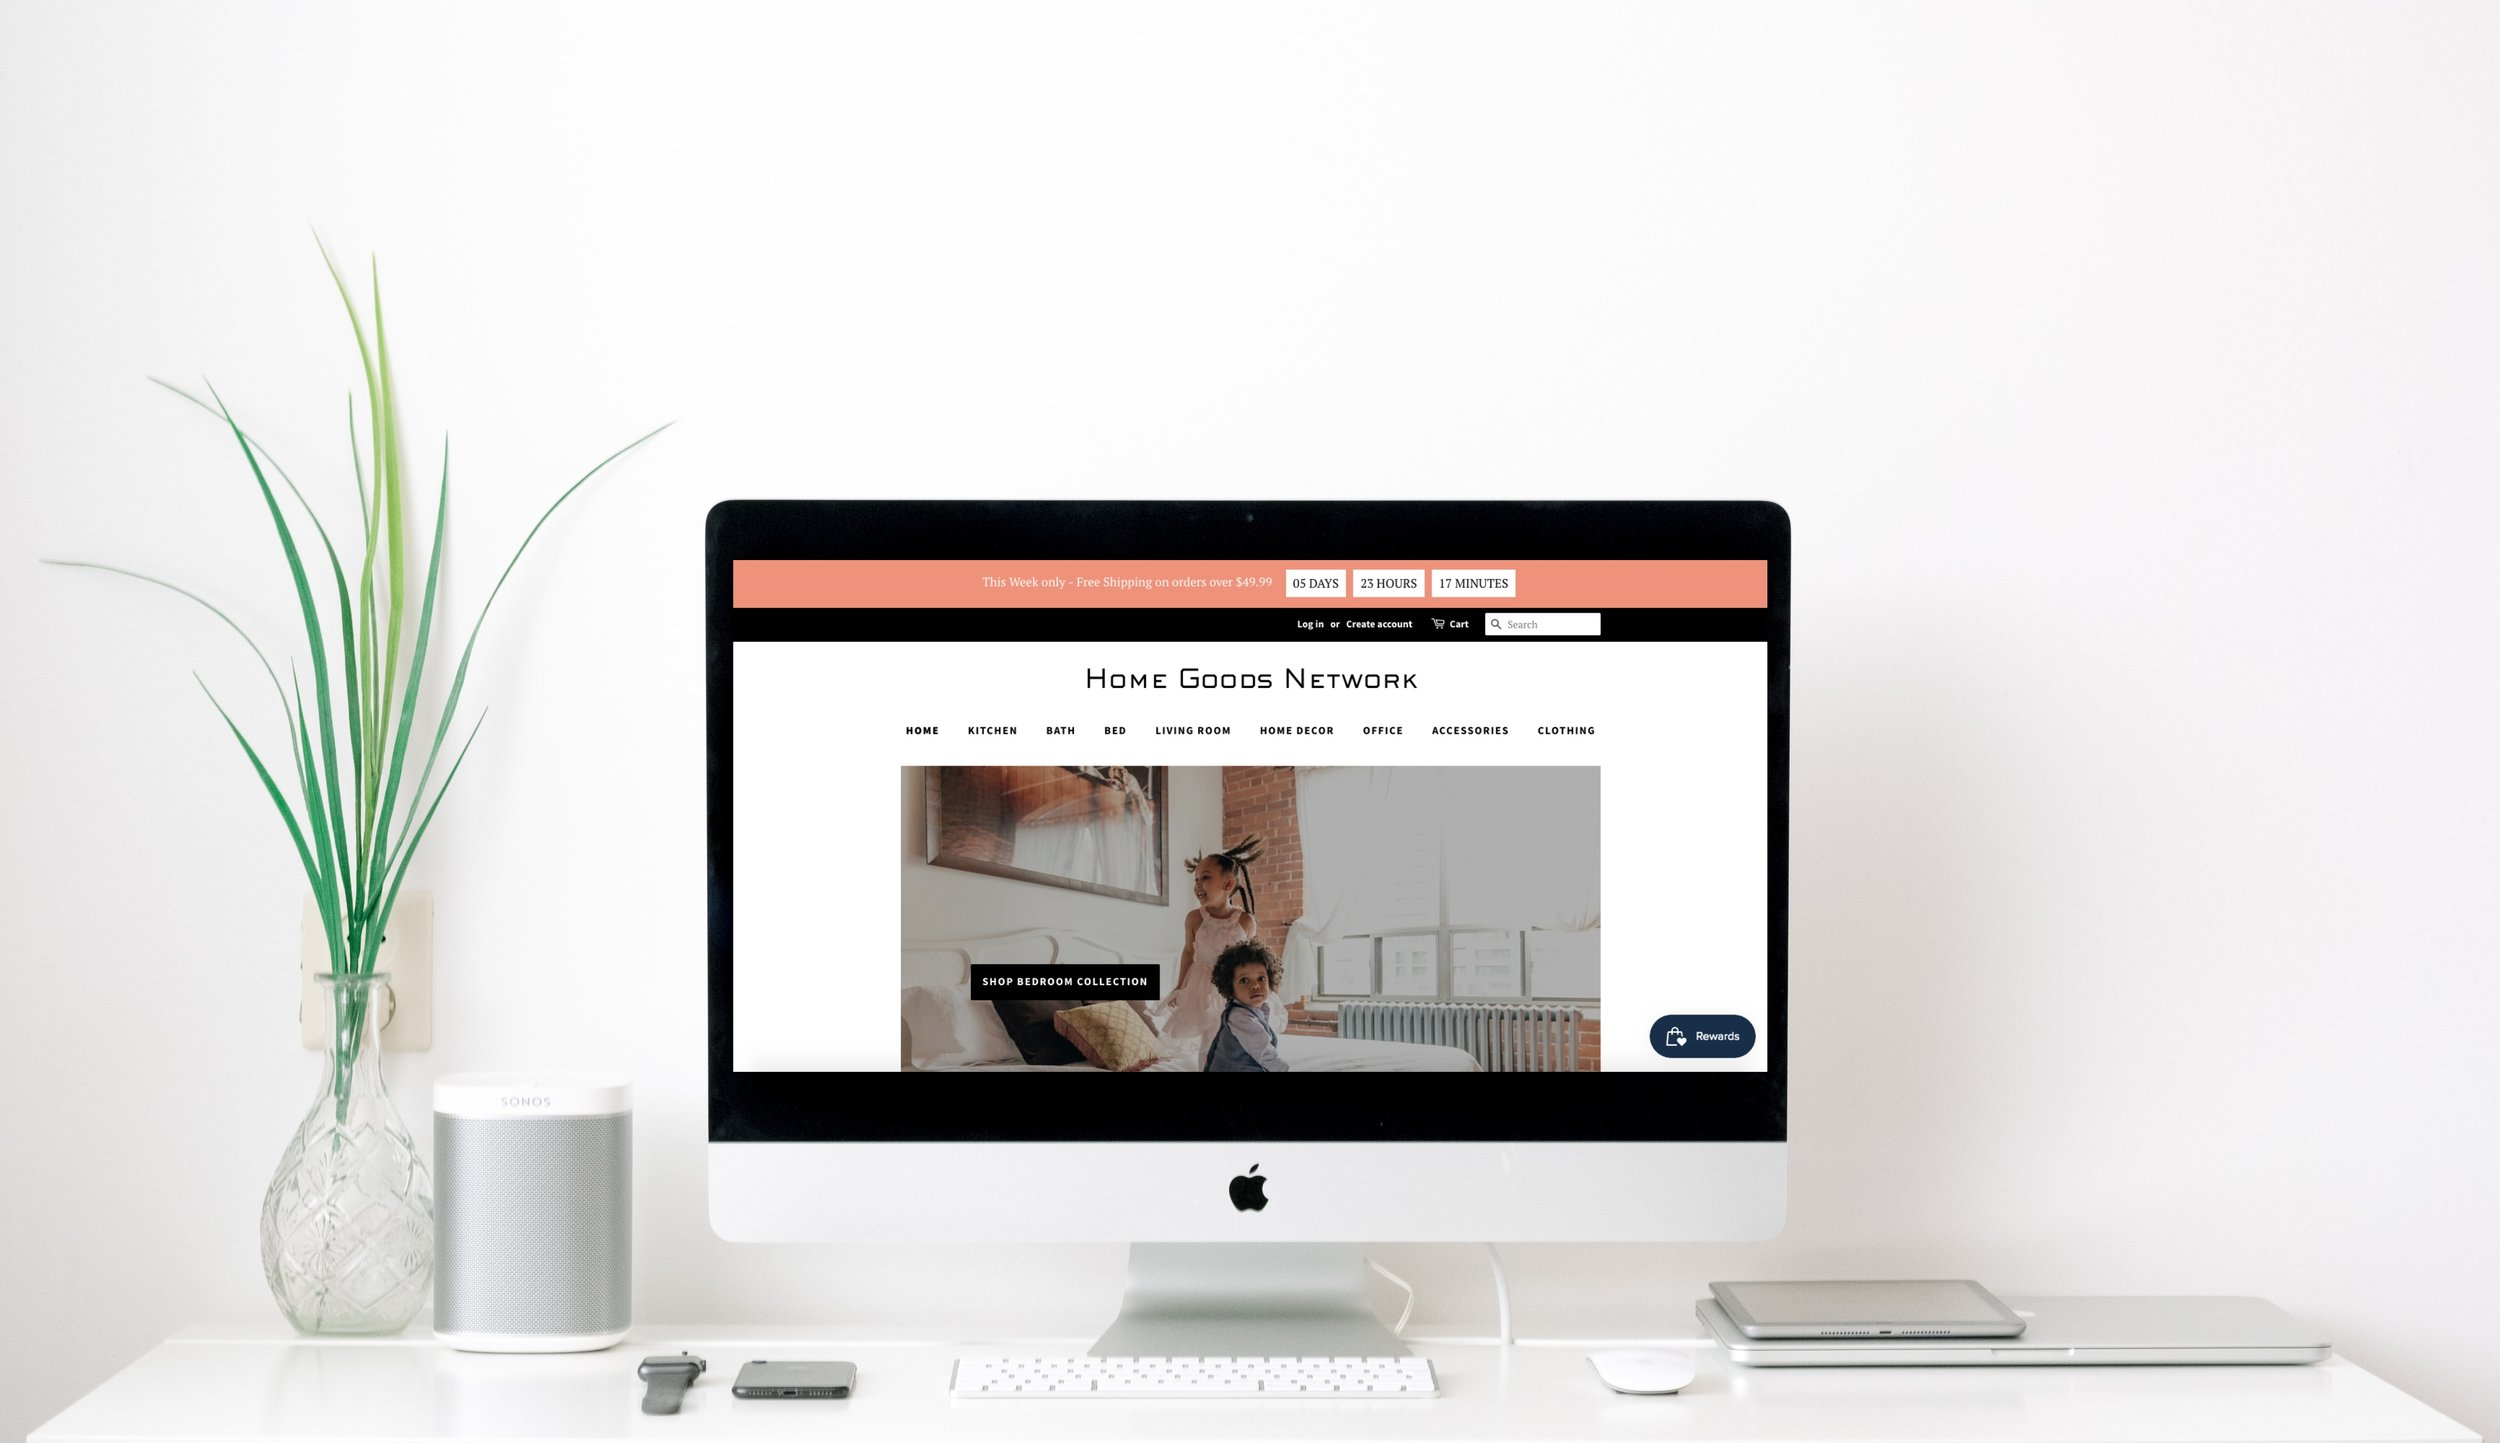 Home Goods Network Marketing Piece.jpg